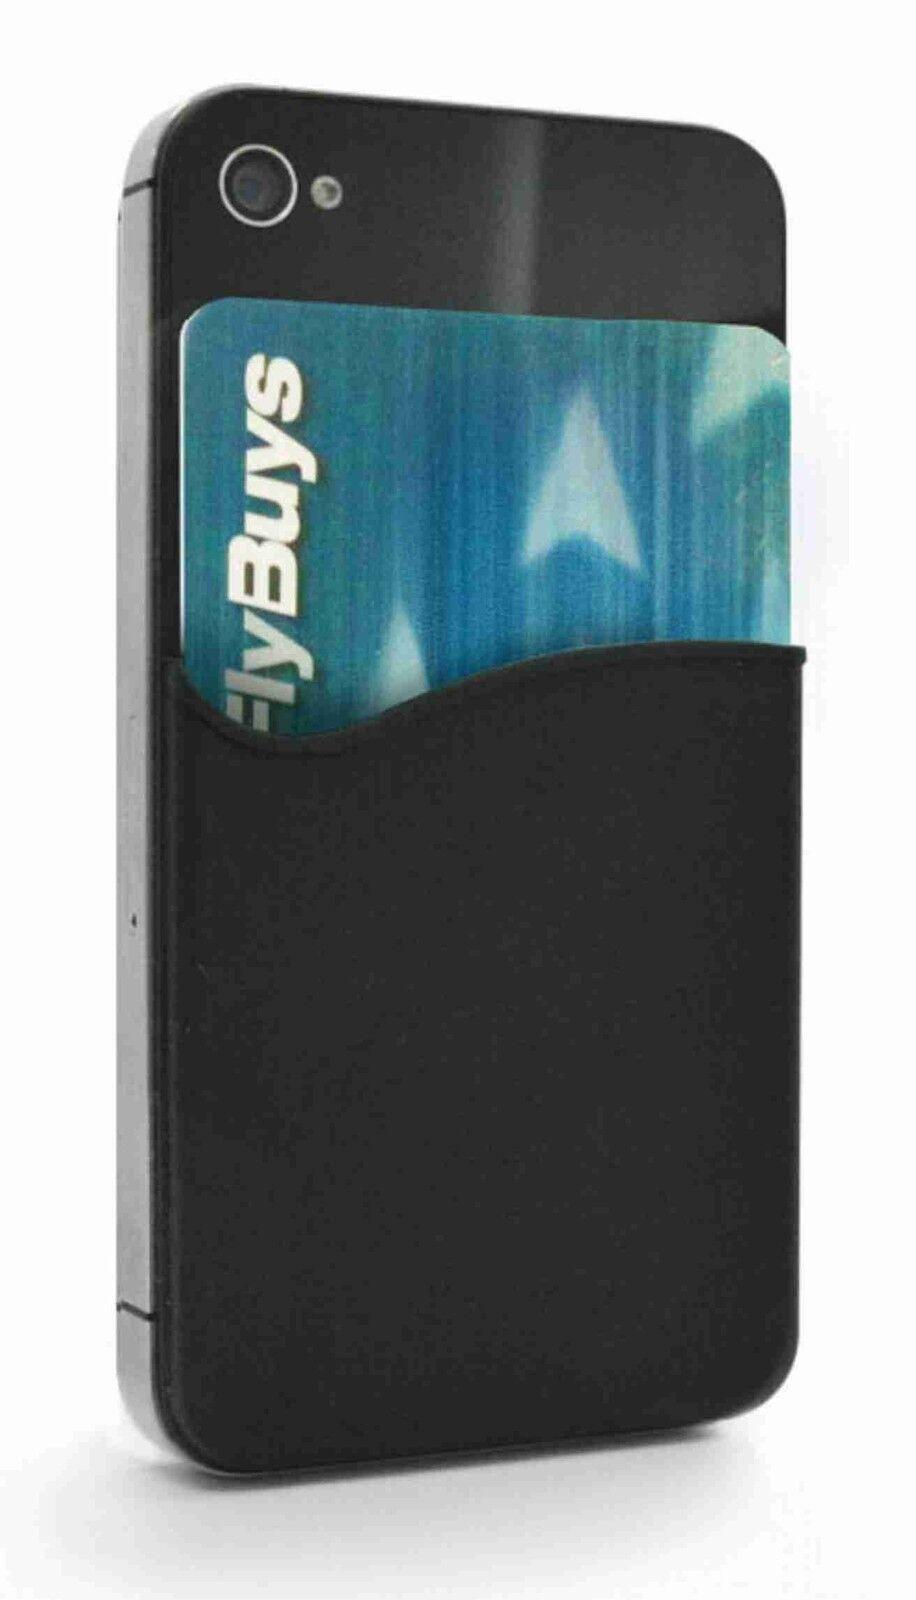 buy online 1fe16 746d9 Details about Smart Silicone Mobile Phone Wallet Card Stick On Cash Credit  Opal Card Holder